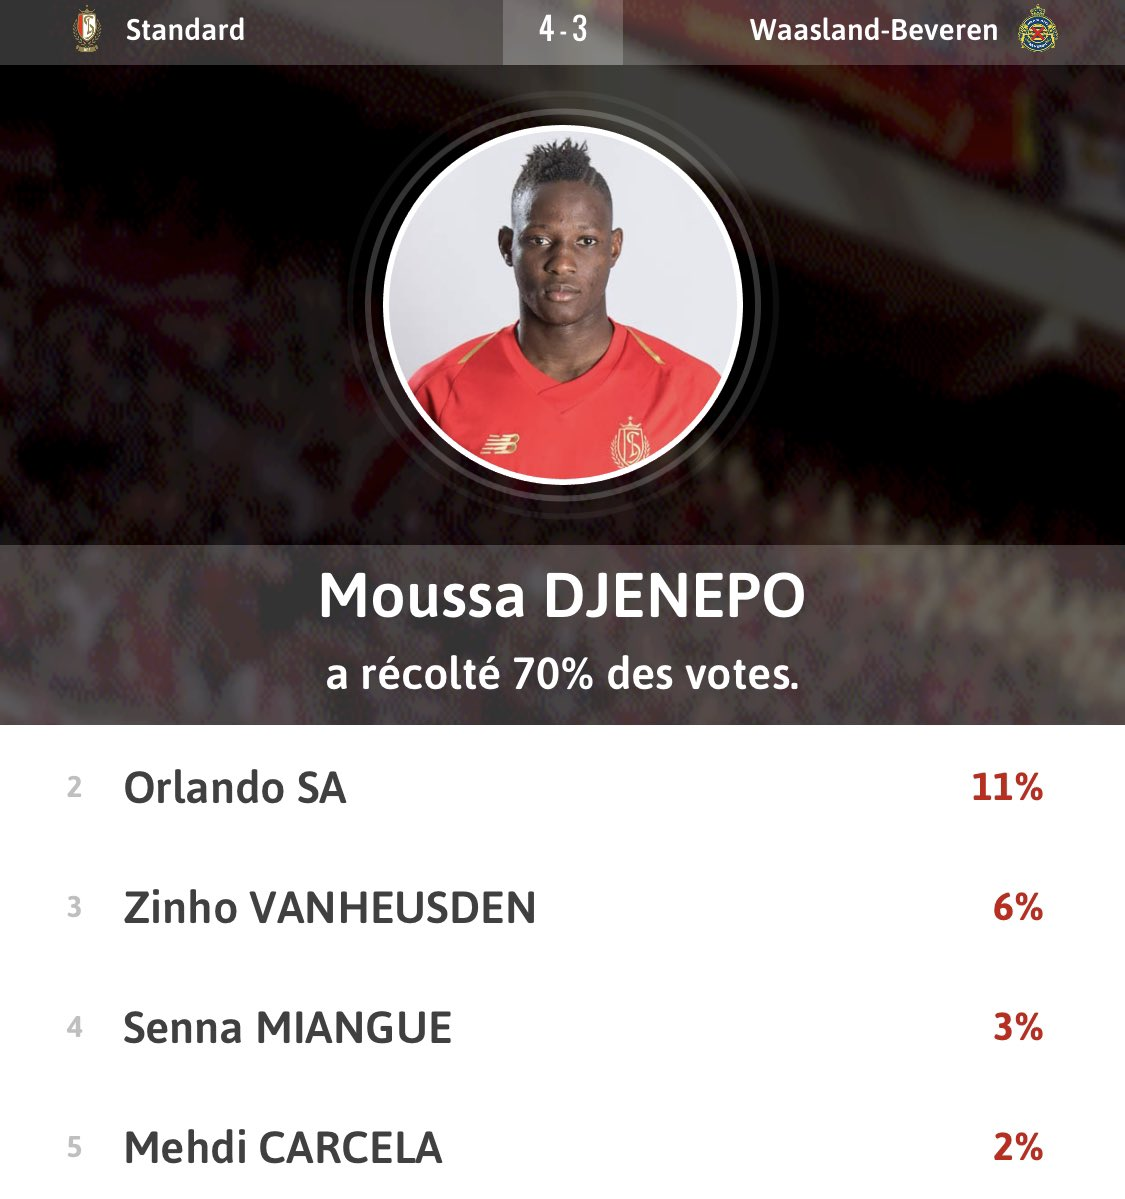 📱 Man Of The Match 🆚 Waasland-Beveren ➡️ @MoussaDjenepo2 🇲🇱 #STAWBE #StandardApp